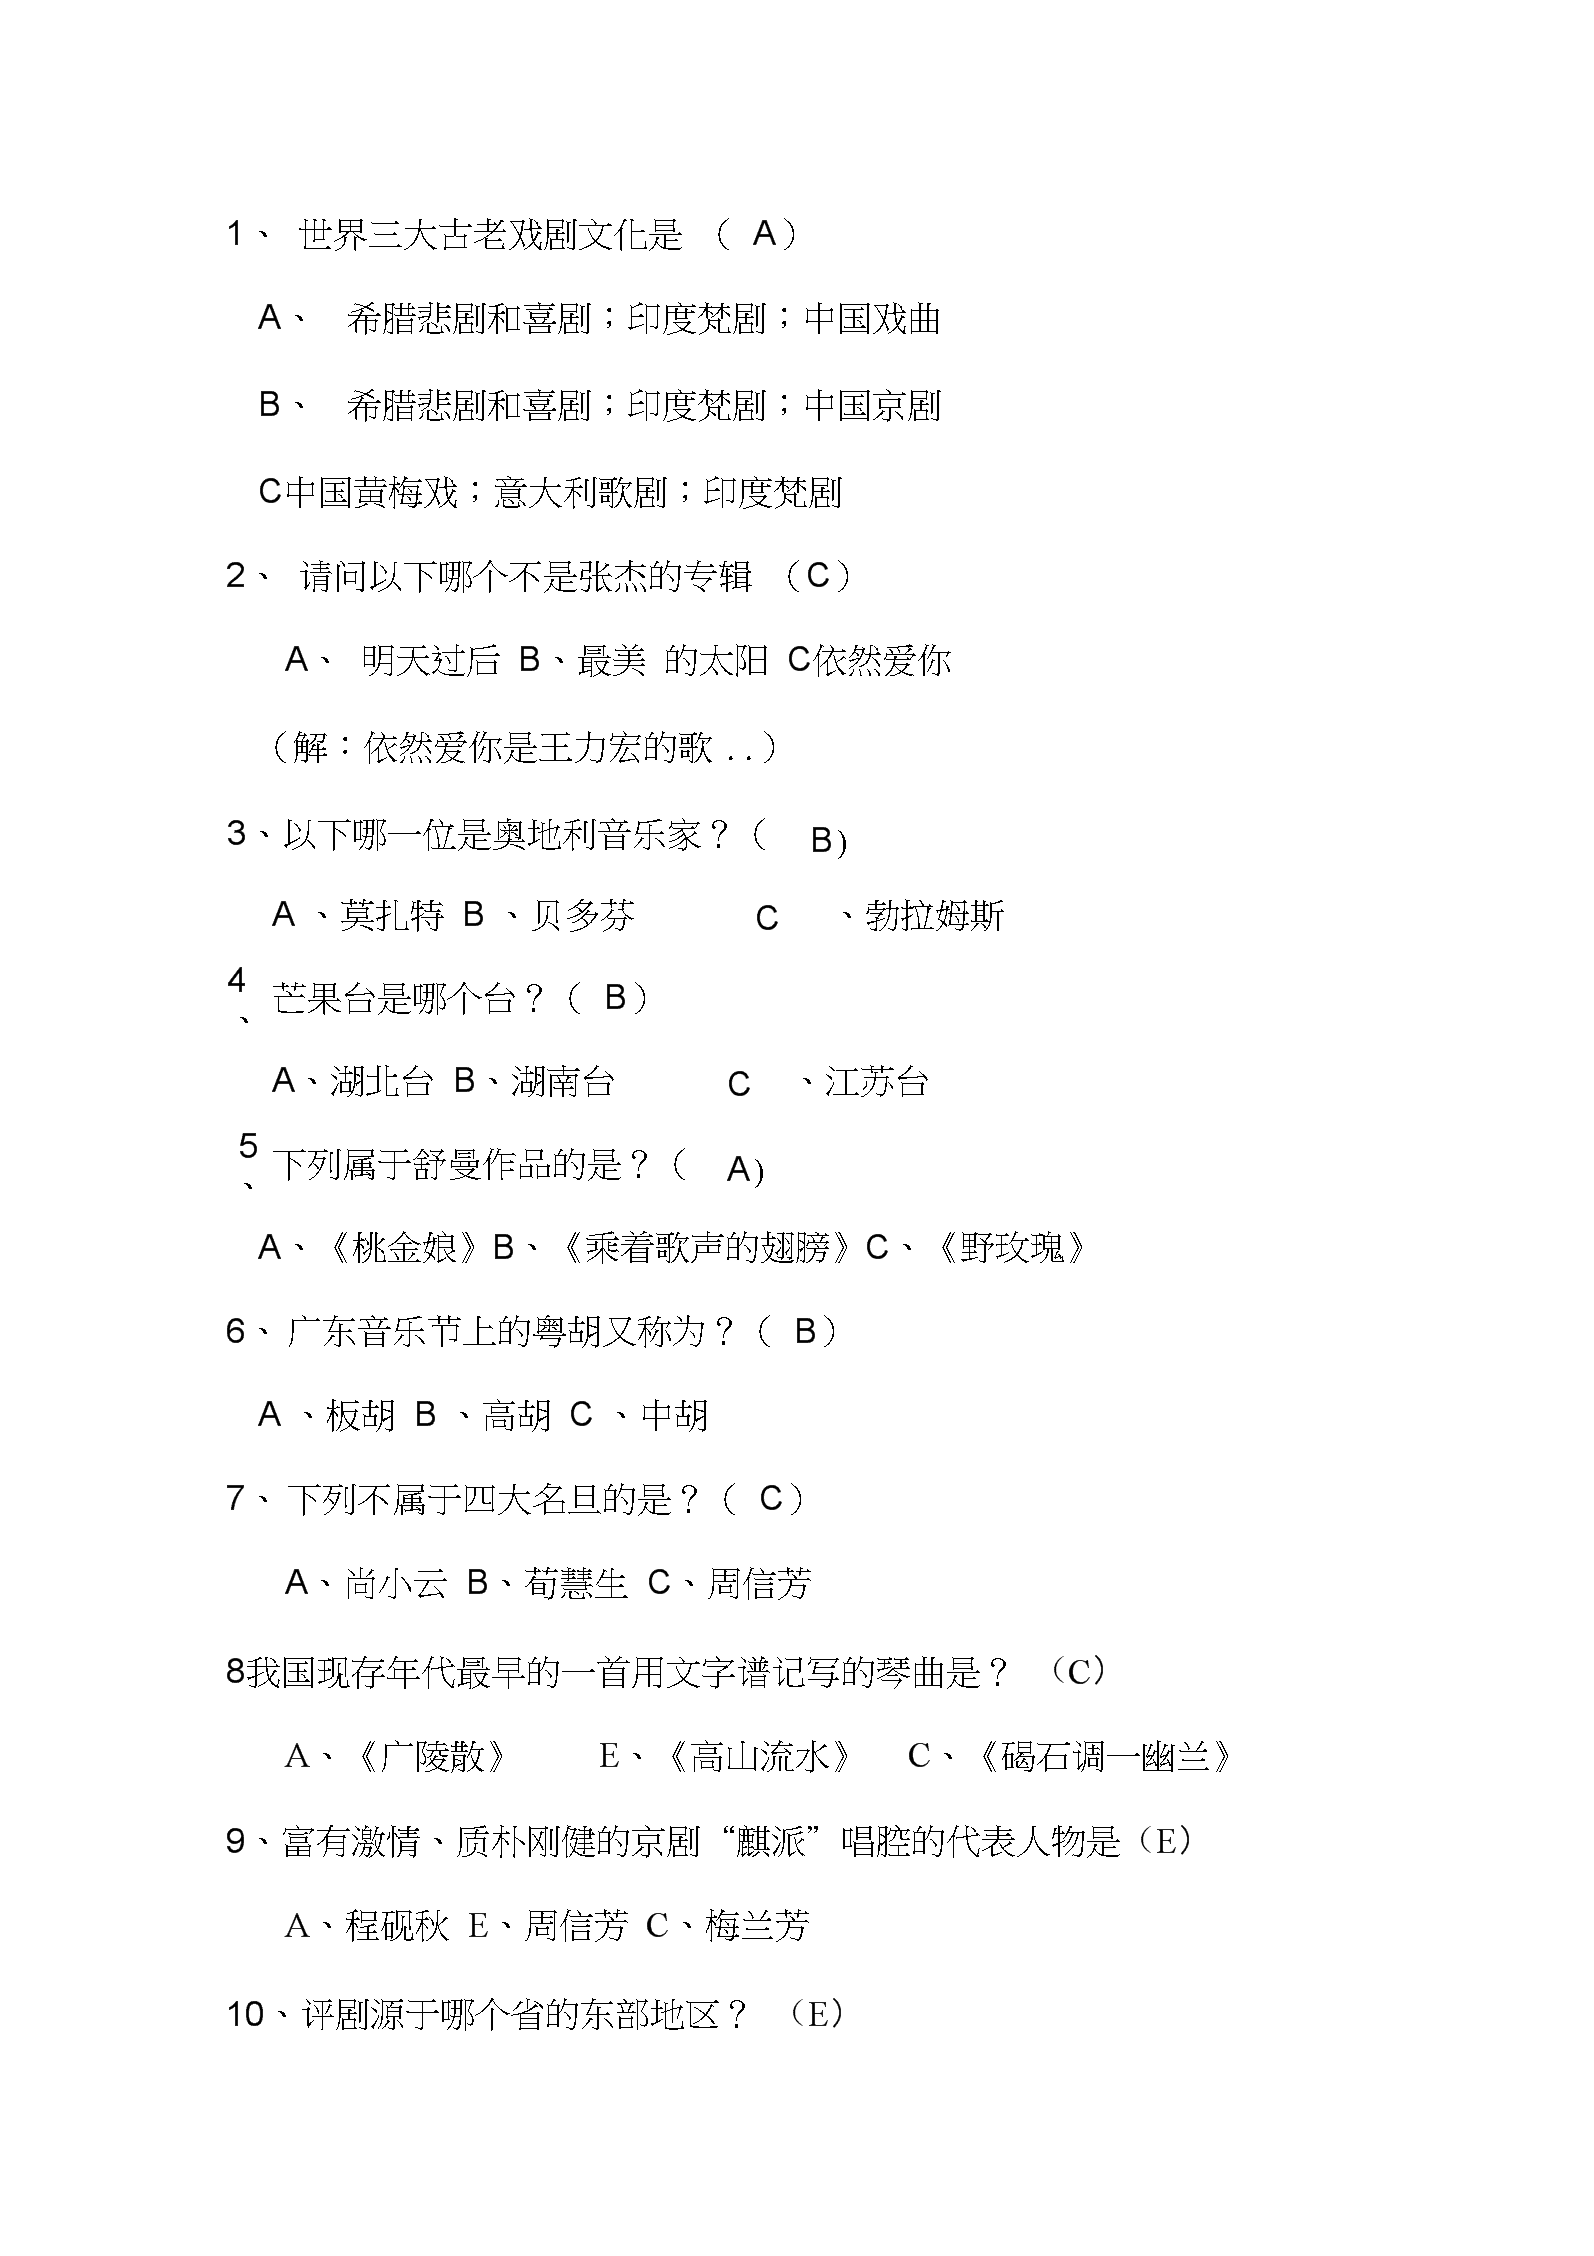 a,京剧 b ,川剧 c ,秦腔 47,王国维在《人间词话》中提出了什么说?图片